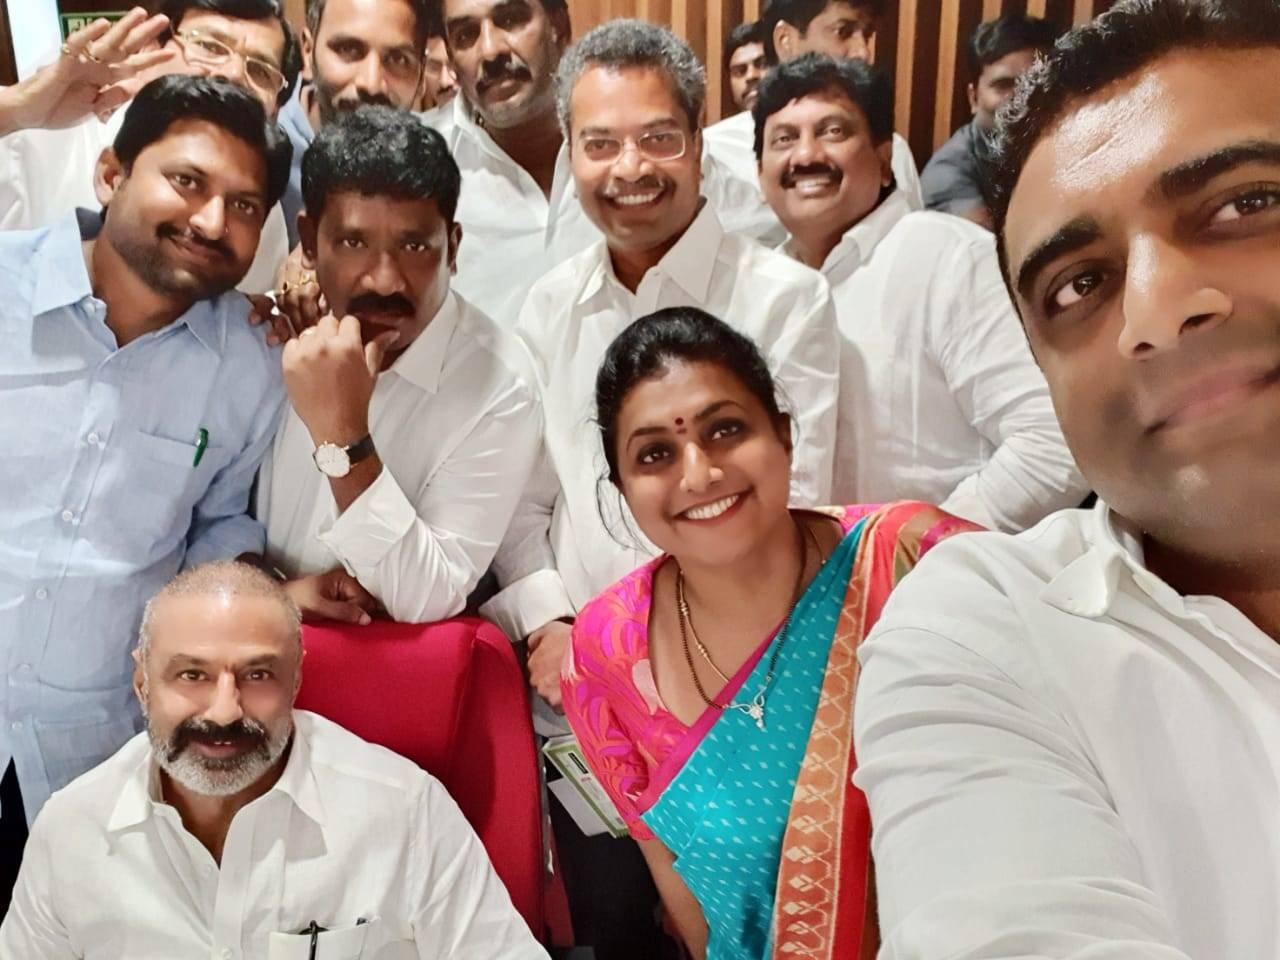 Viral Pic: Nandamuri Balakrishna's impeccable craze among rival party MLAs  | Telugu Movie News - Times of India